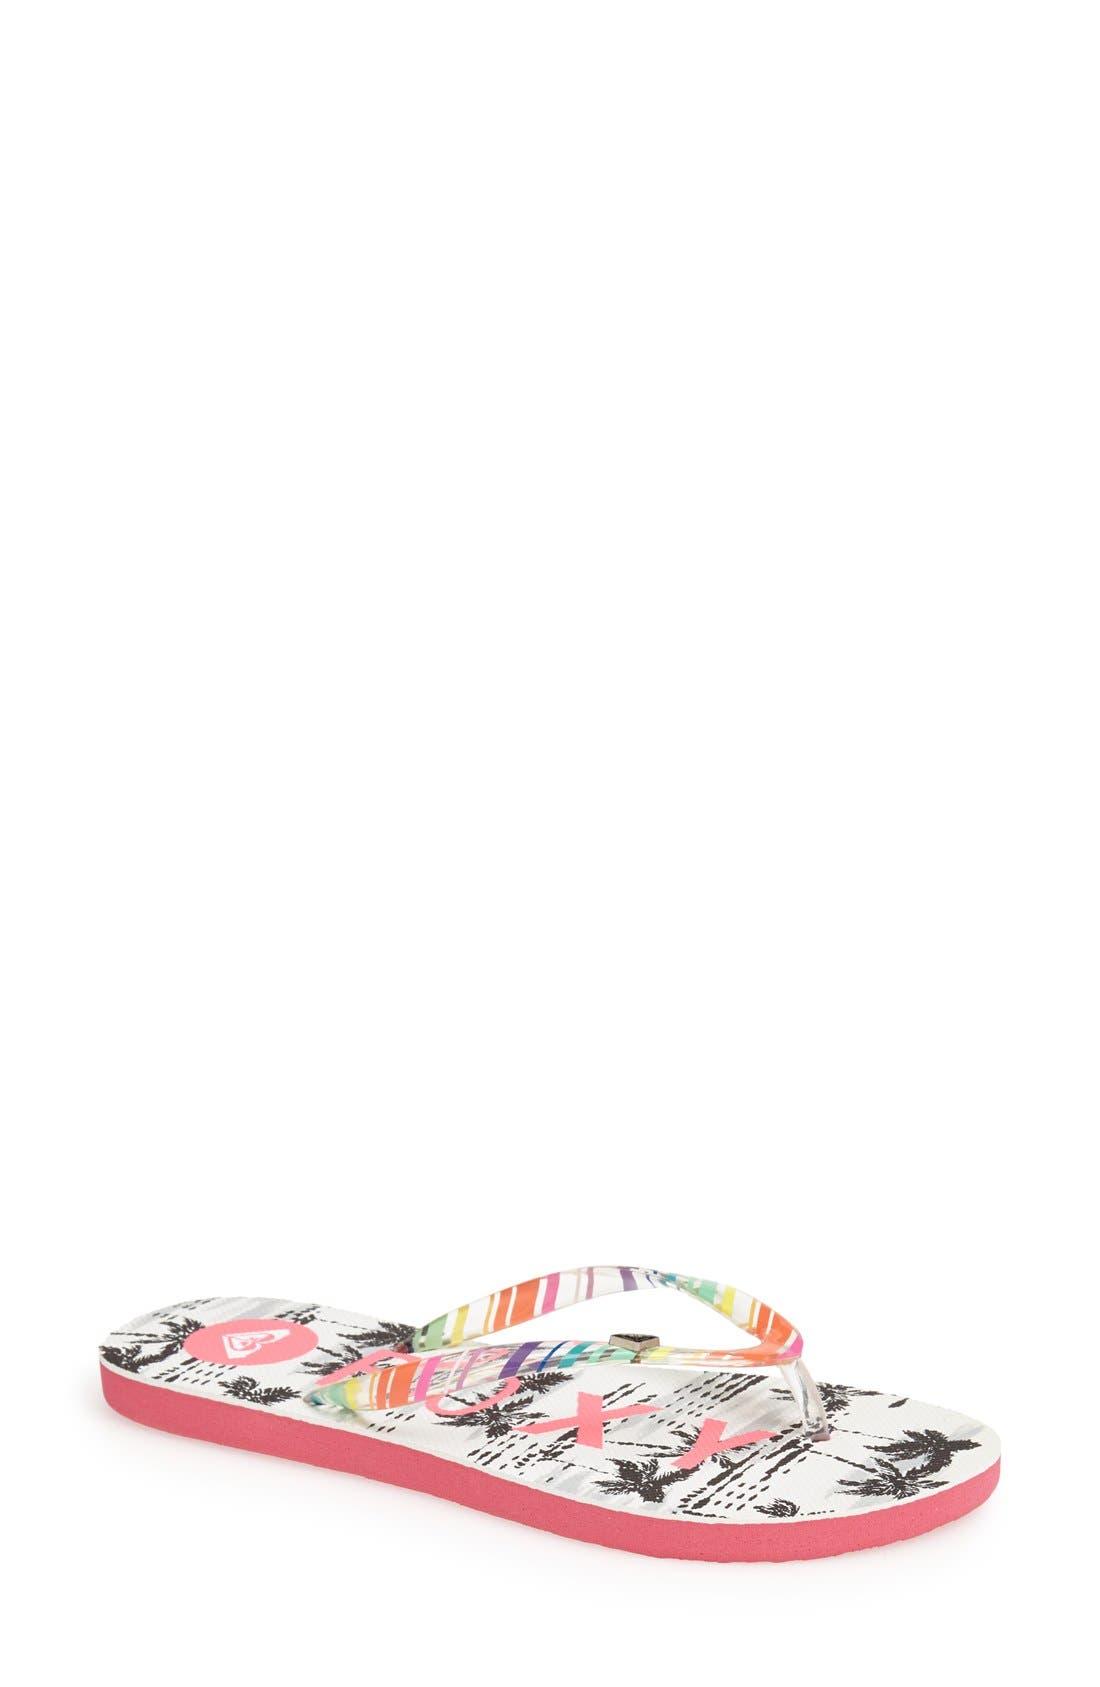 Alternate Image 1 Selected - Roxy 'Mimosa V' Sandal (Women)